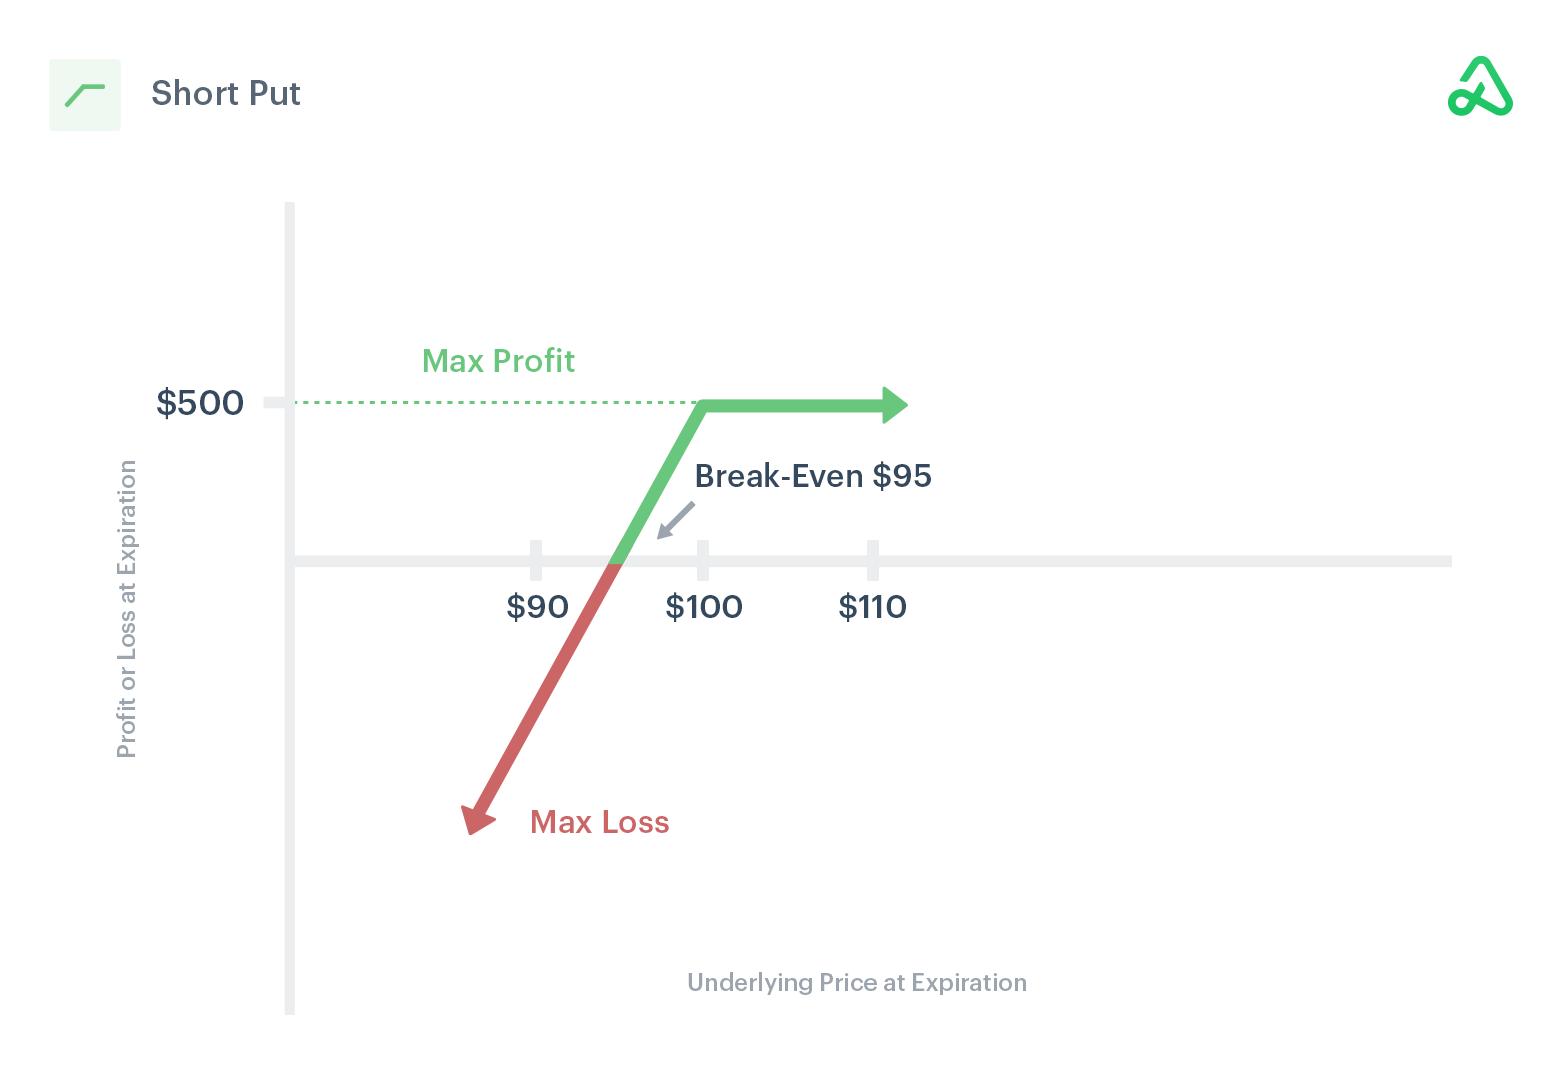 Short put payoff diagram